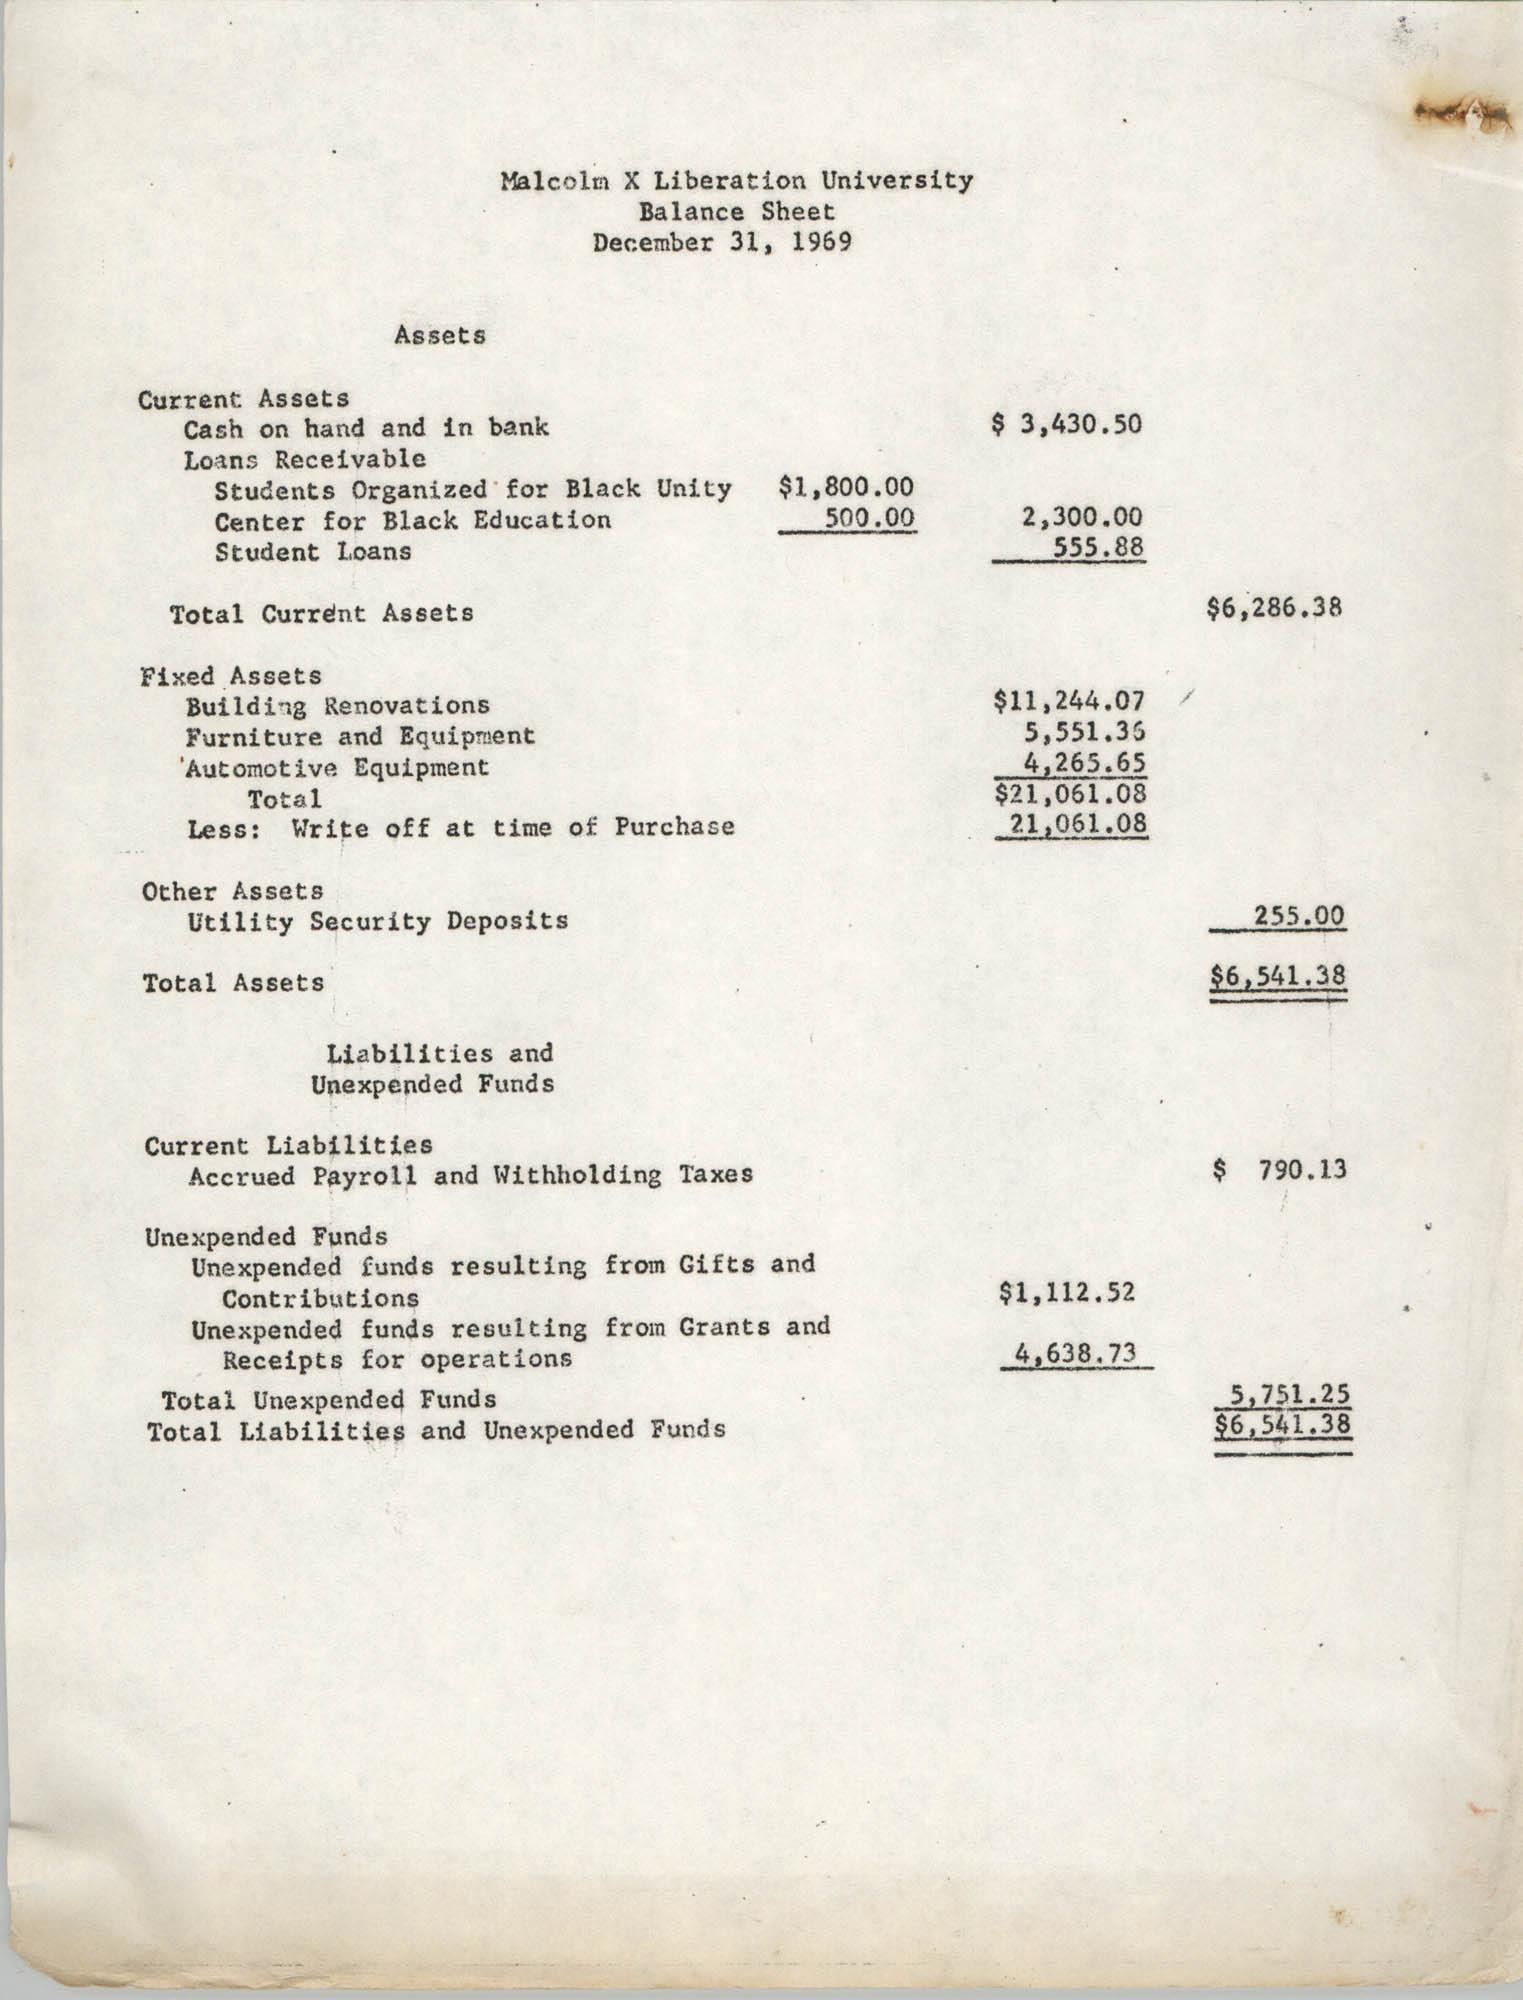 Malcolm X Liberation University Balance Sheet, December 31, 1969